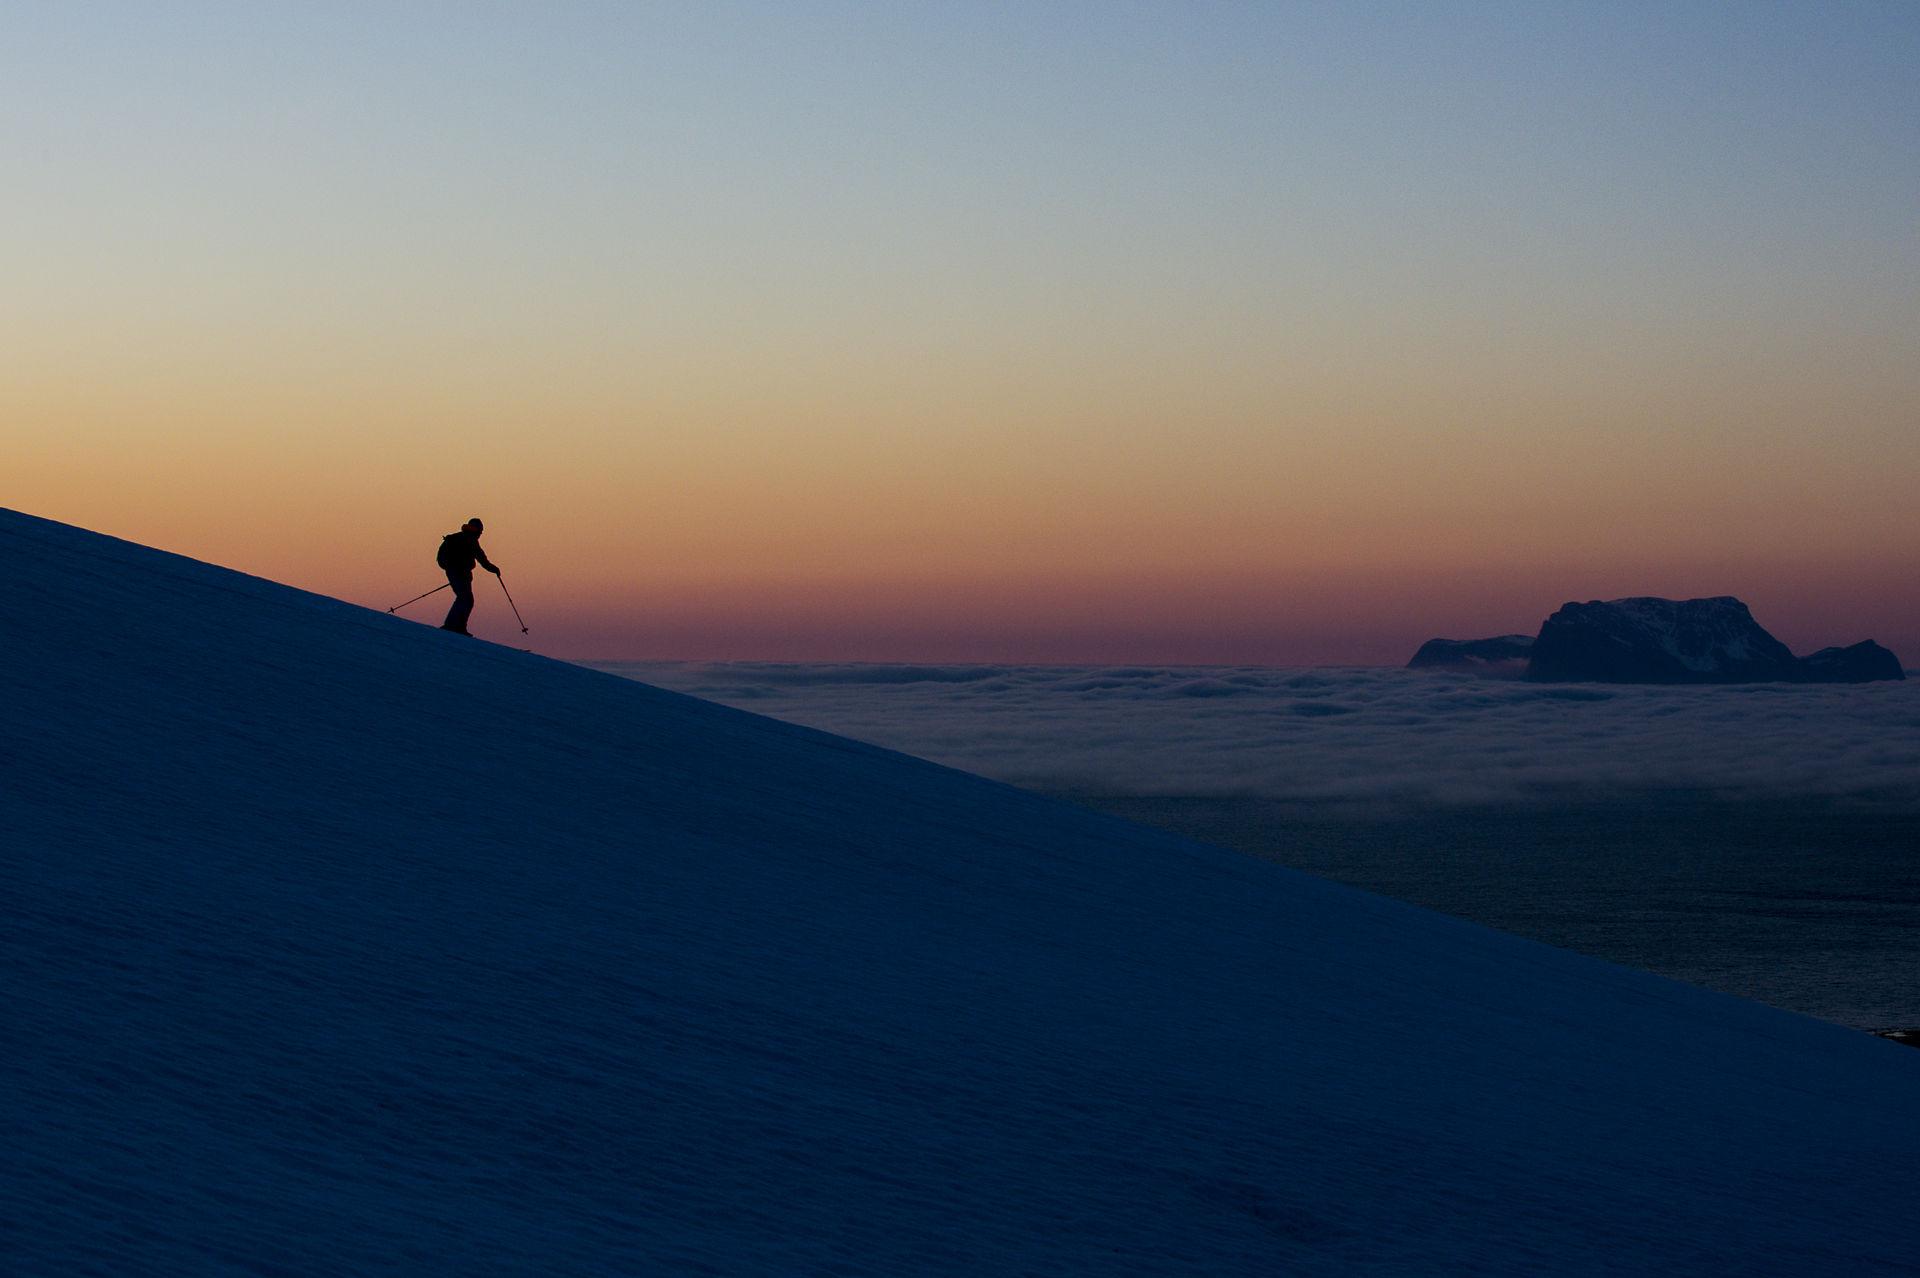 Sunset in late winter © Jesper Molin